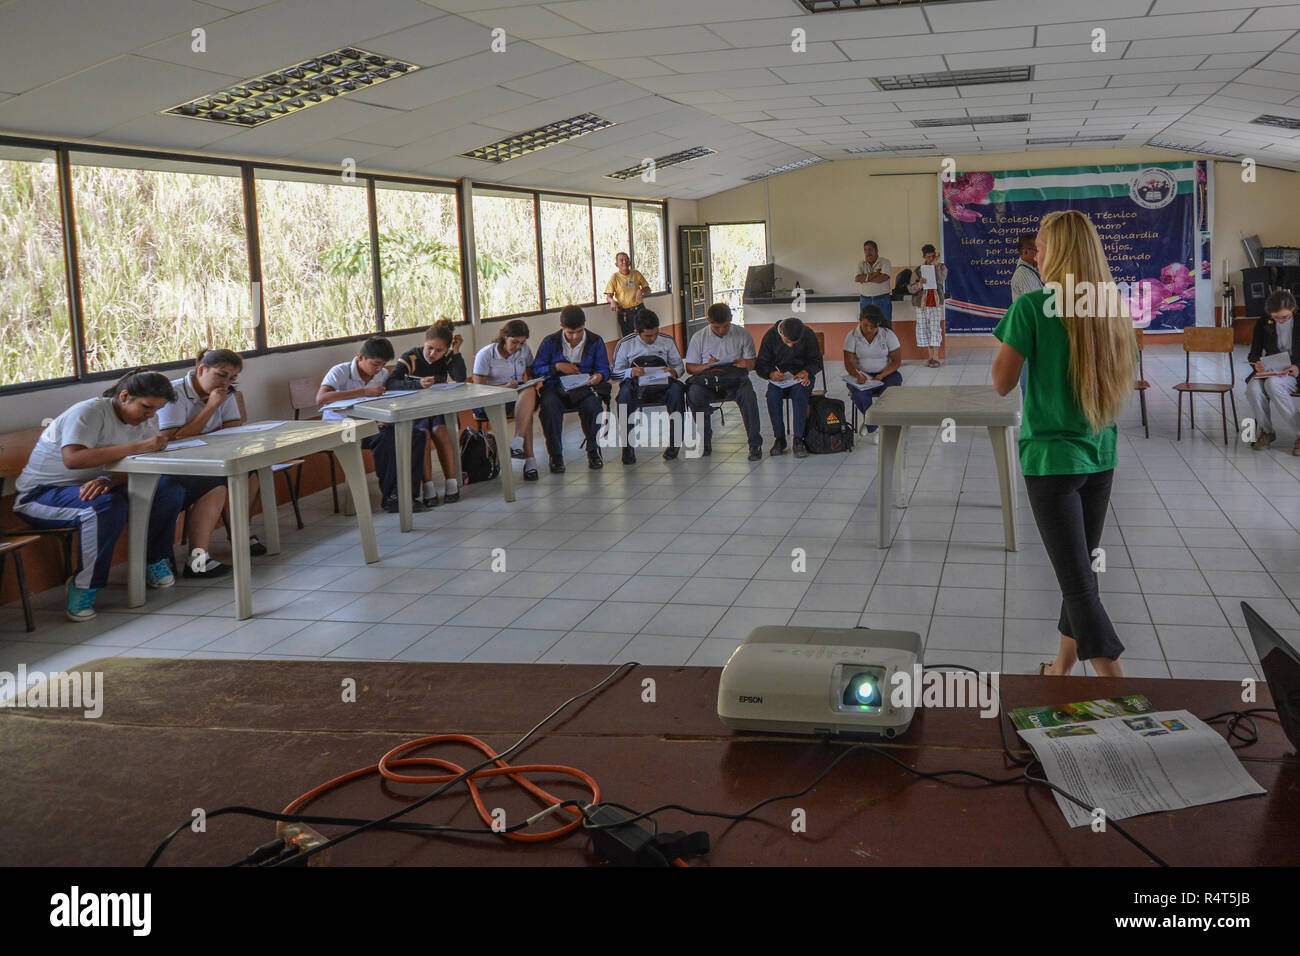 A small Ecuadorian school in the El Oro Province of Ecuador. - Stock Image